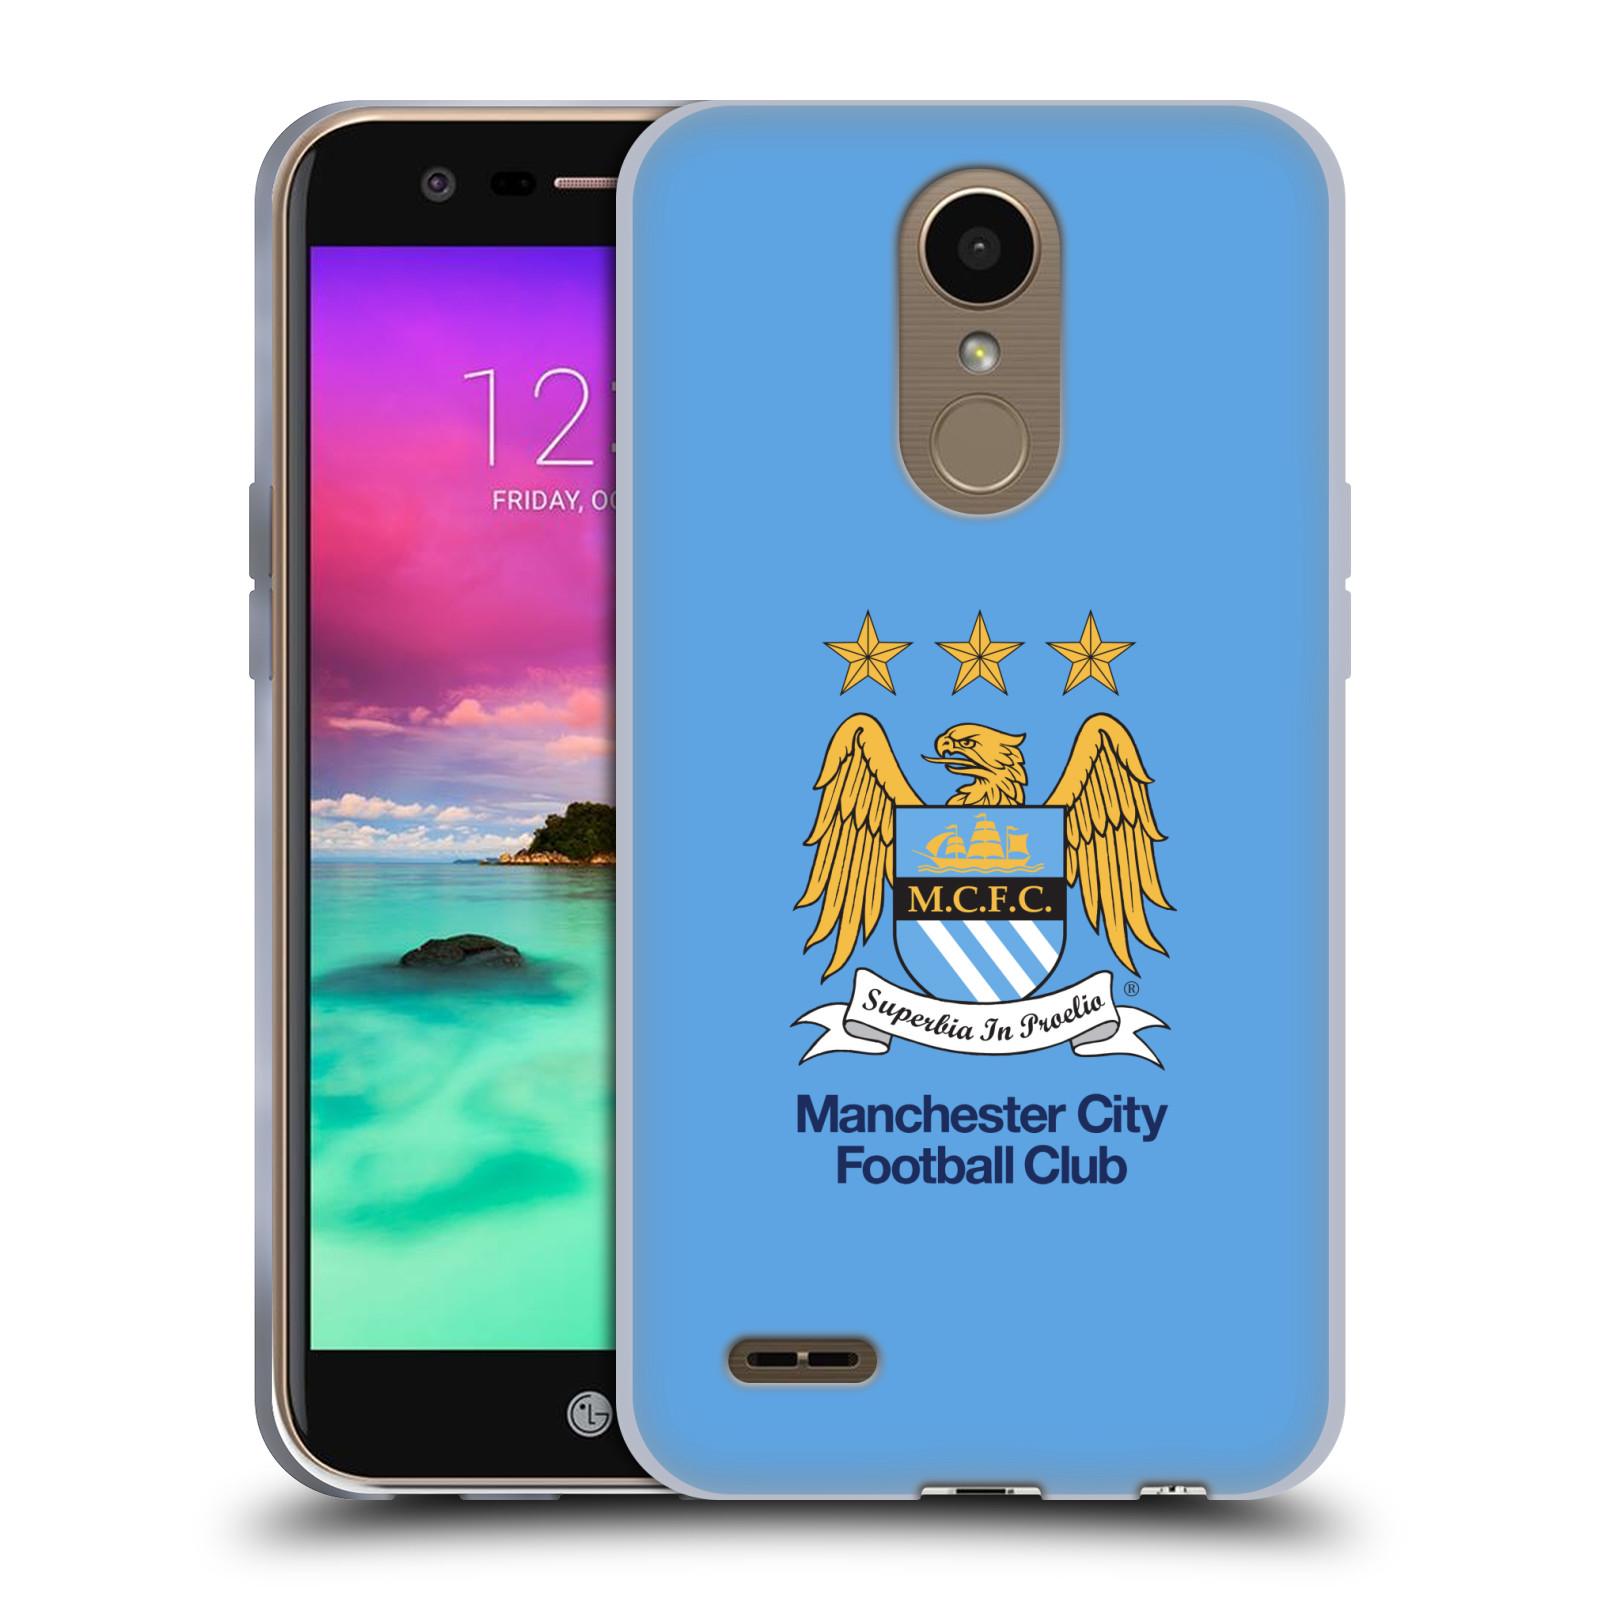 HEAD CASE silikonový obal na mobil LG K10 2017 / K10 2017 DUAL SIM Fotbalový klub Manchester City nebesky modrá pozadí velký znak pták